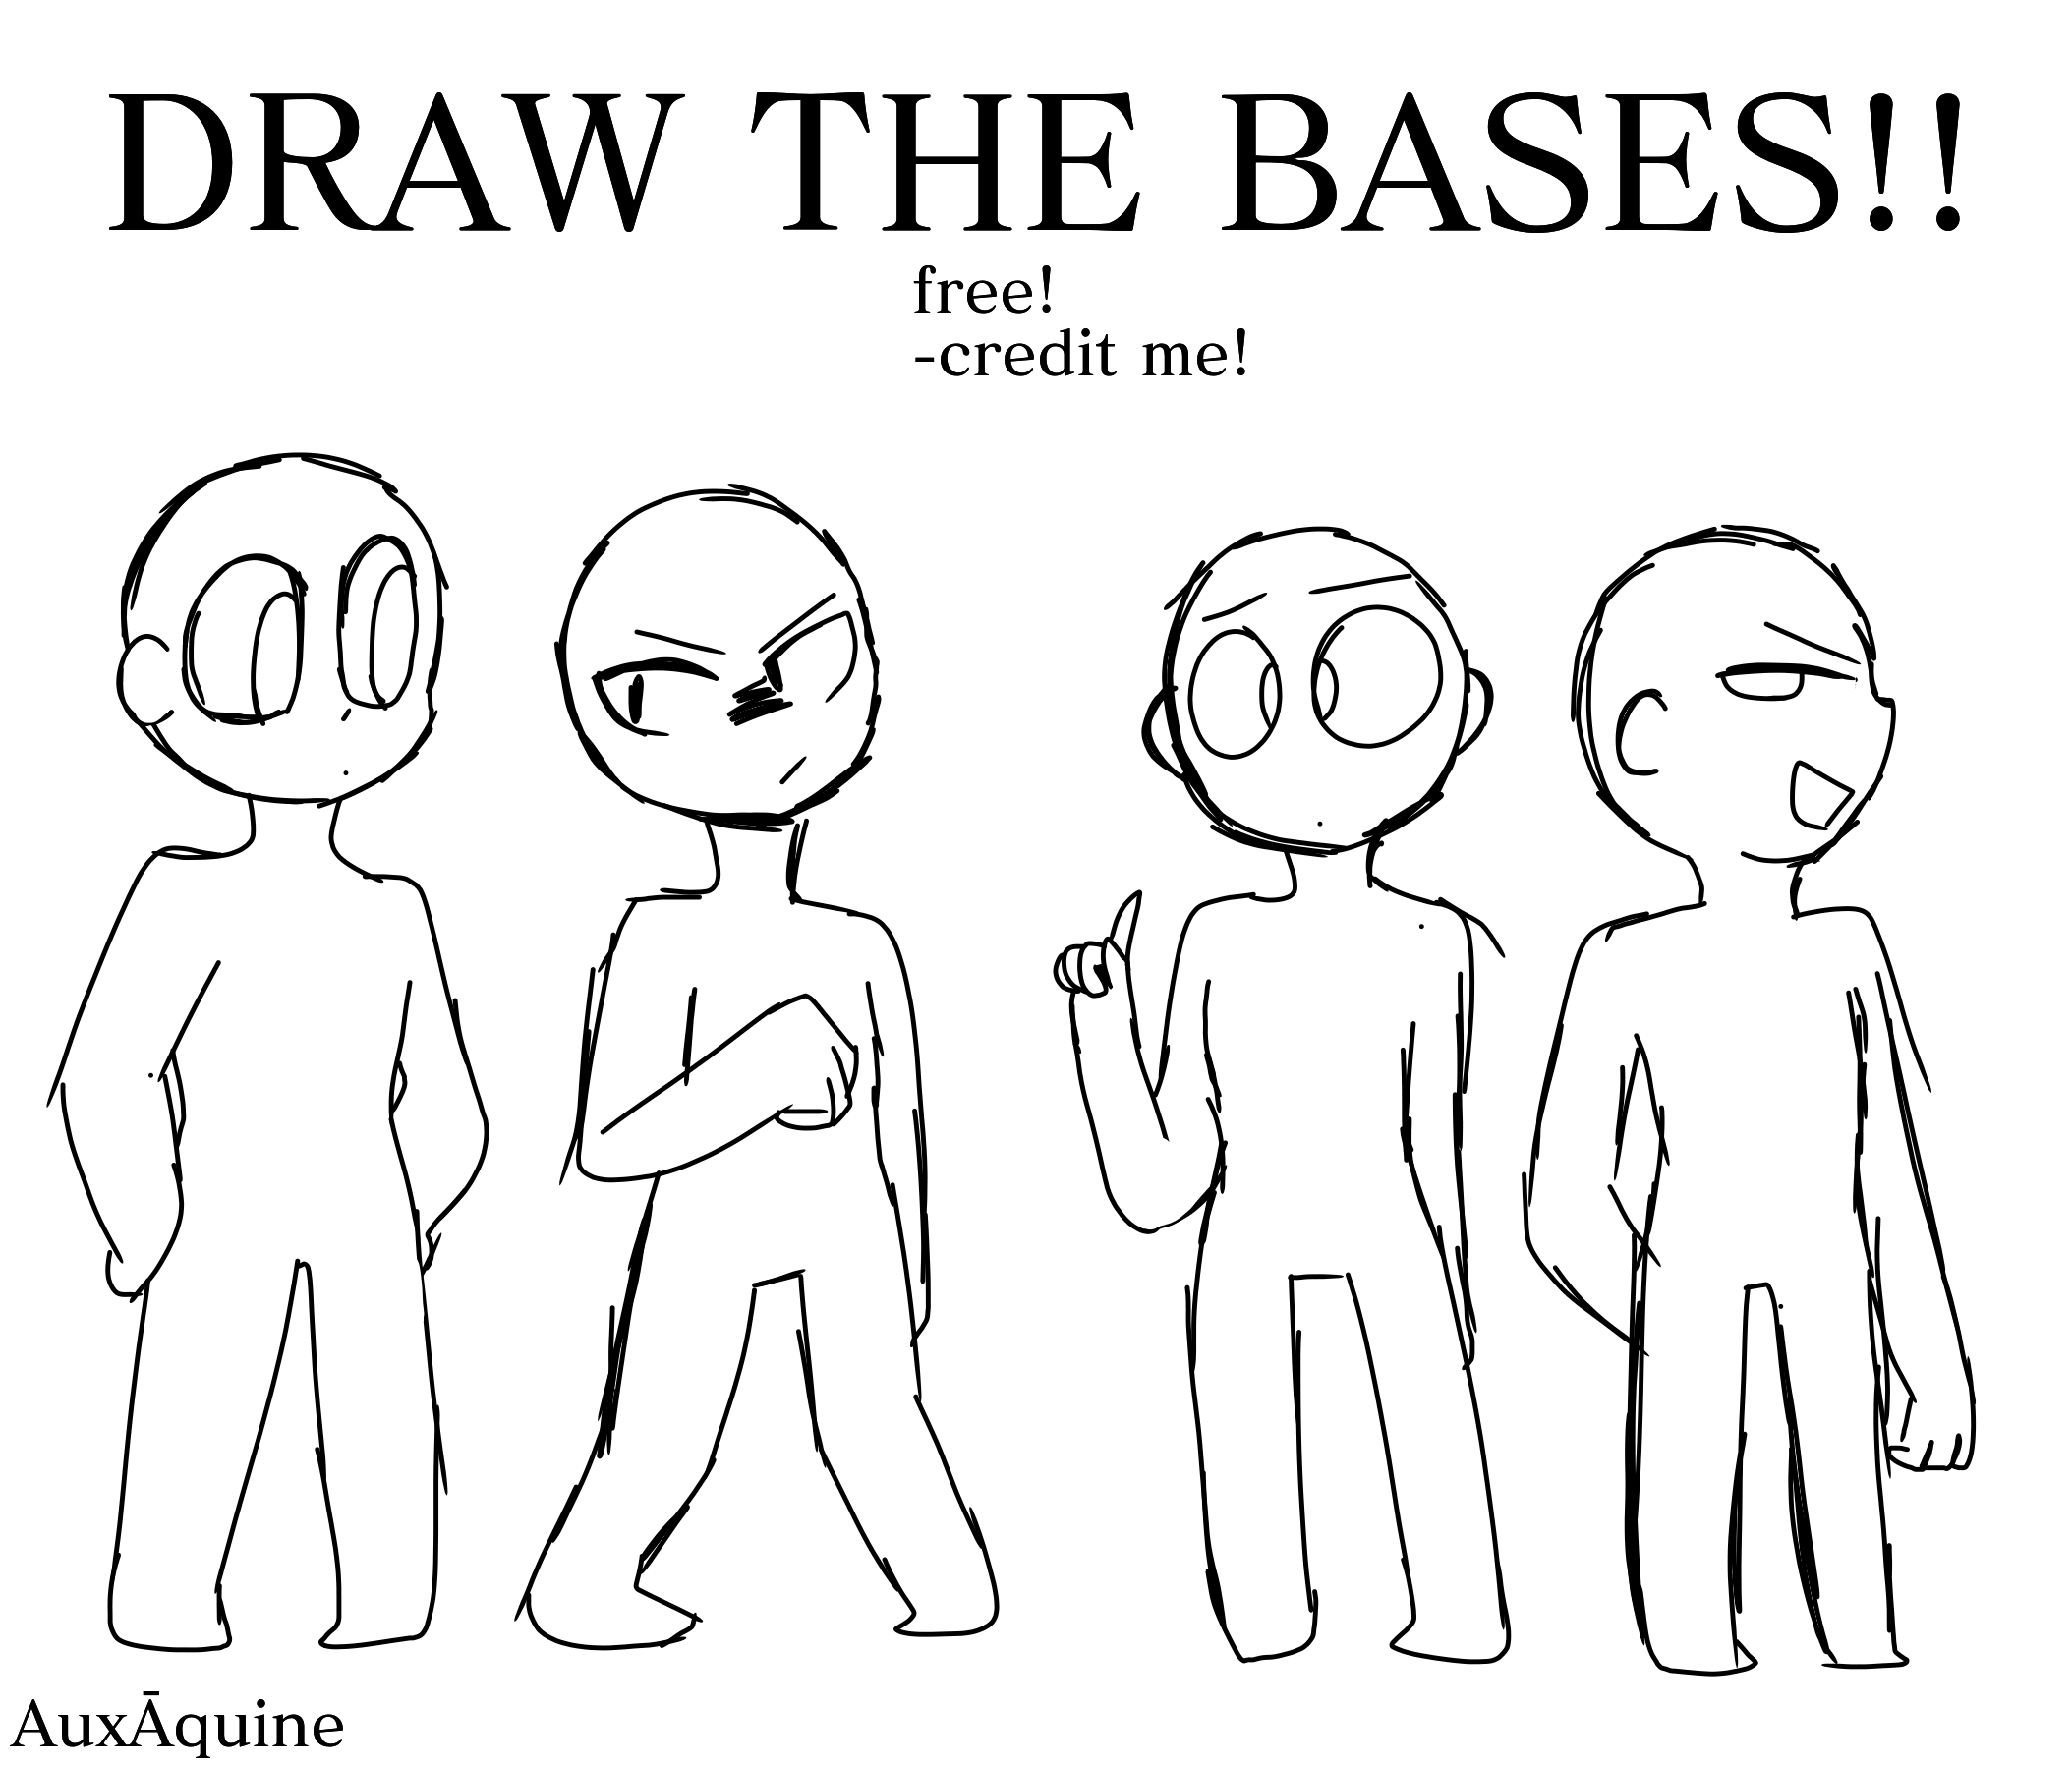 Draw The Bases 3 Free Jemonfucious08 Illustrations Art Street